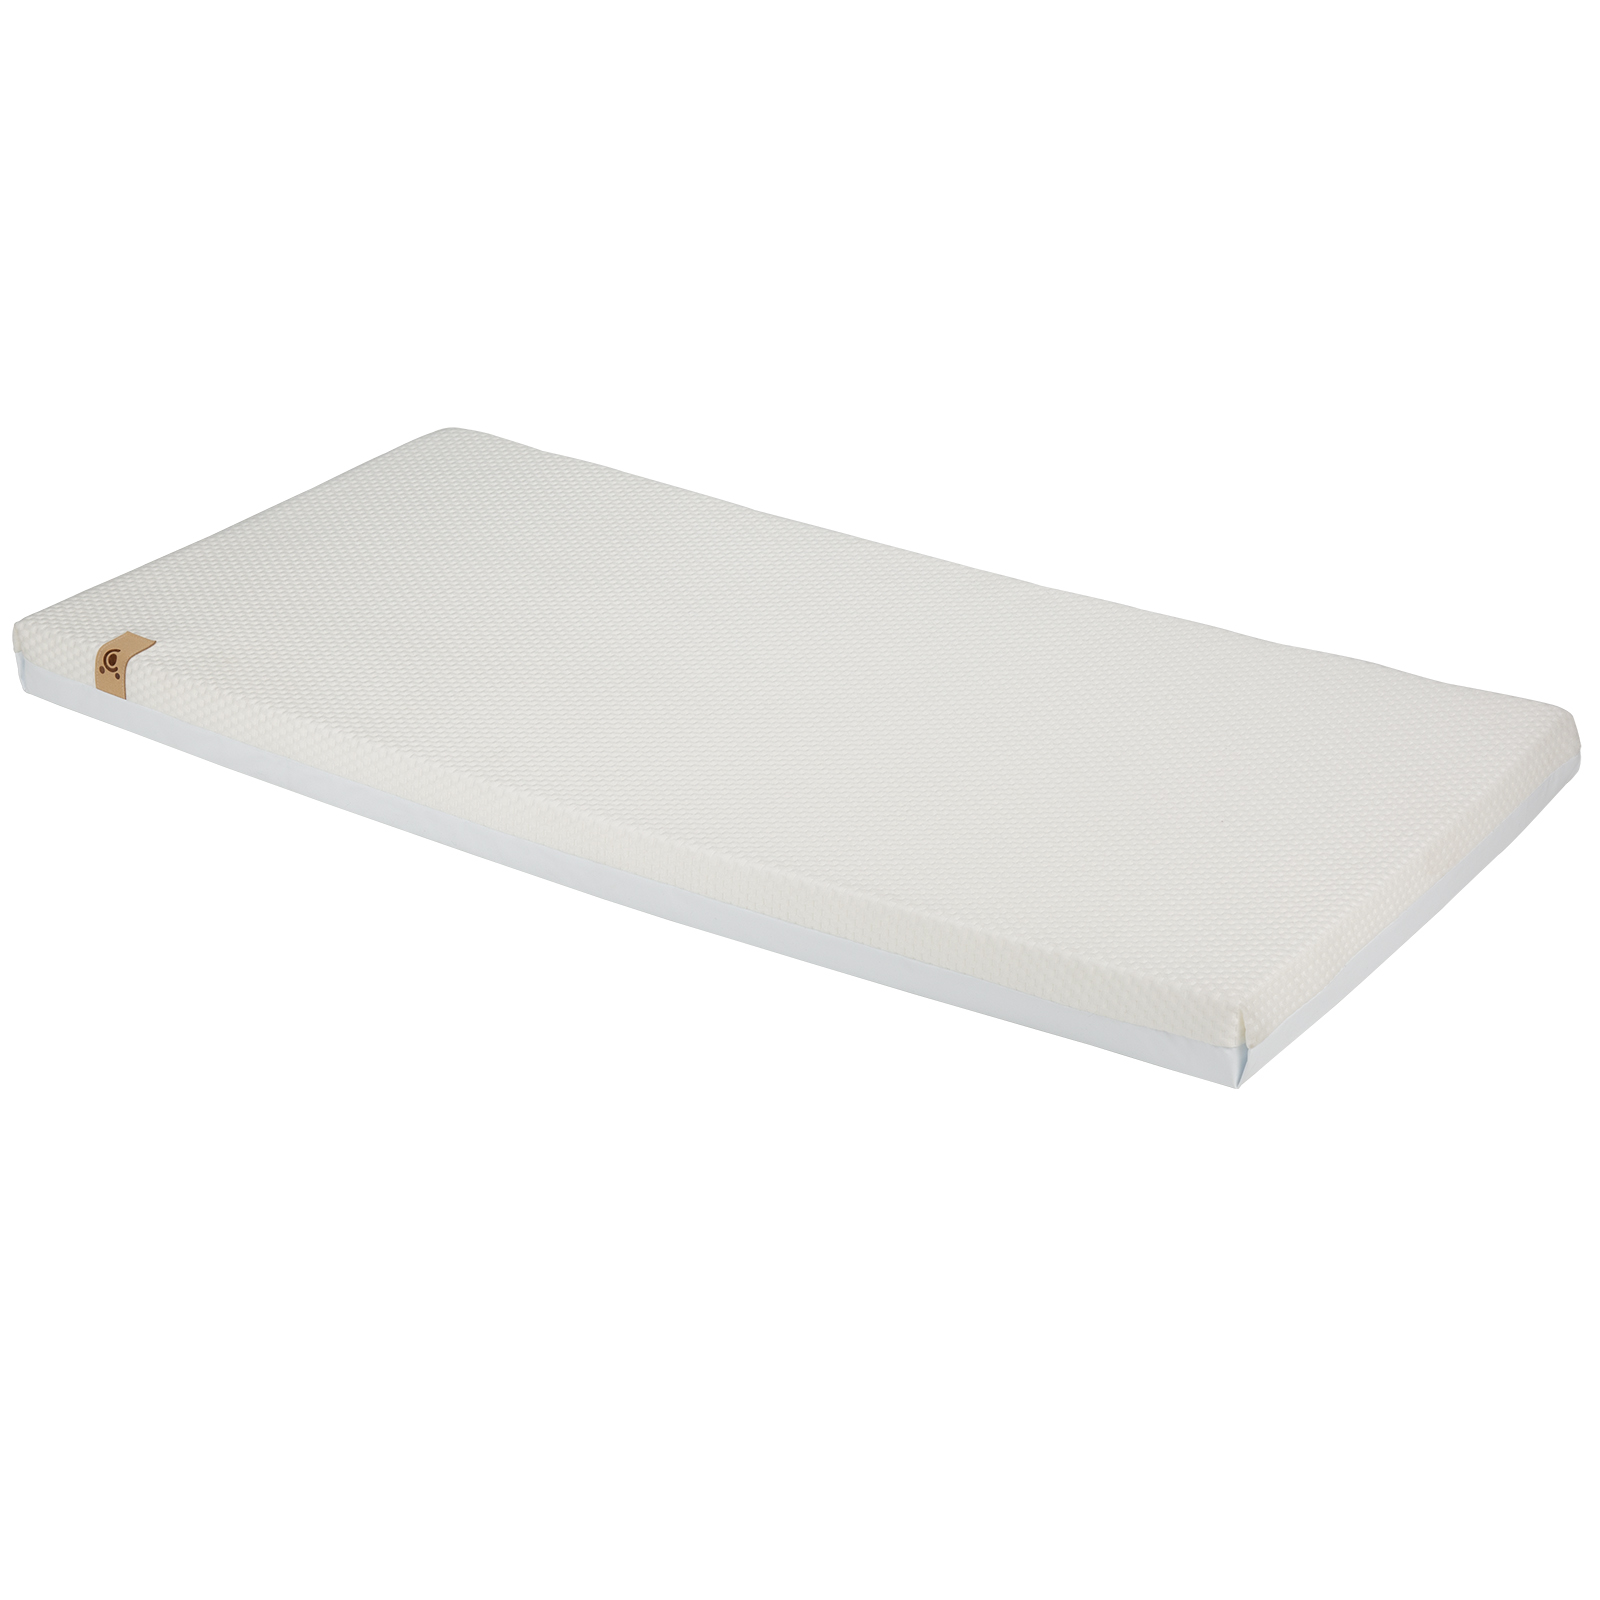 CUDDLECO  Pěnová matrace Lullaby 120 x 60 cm, Cream